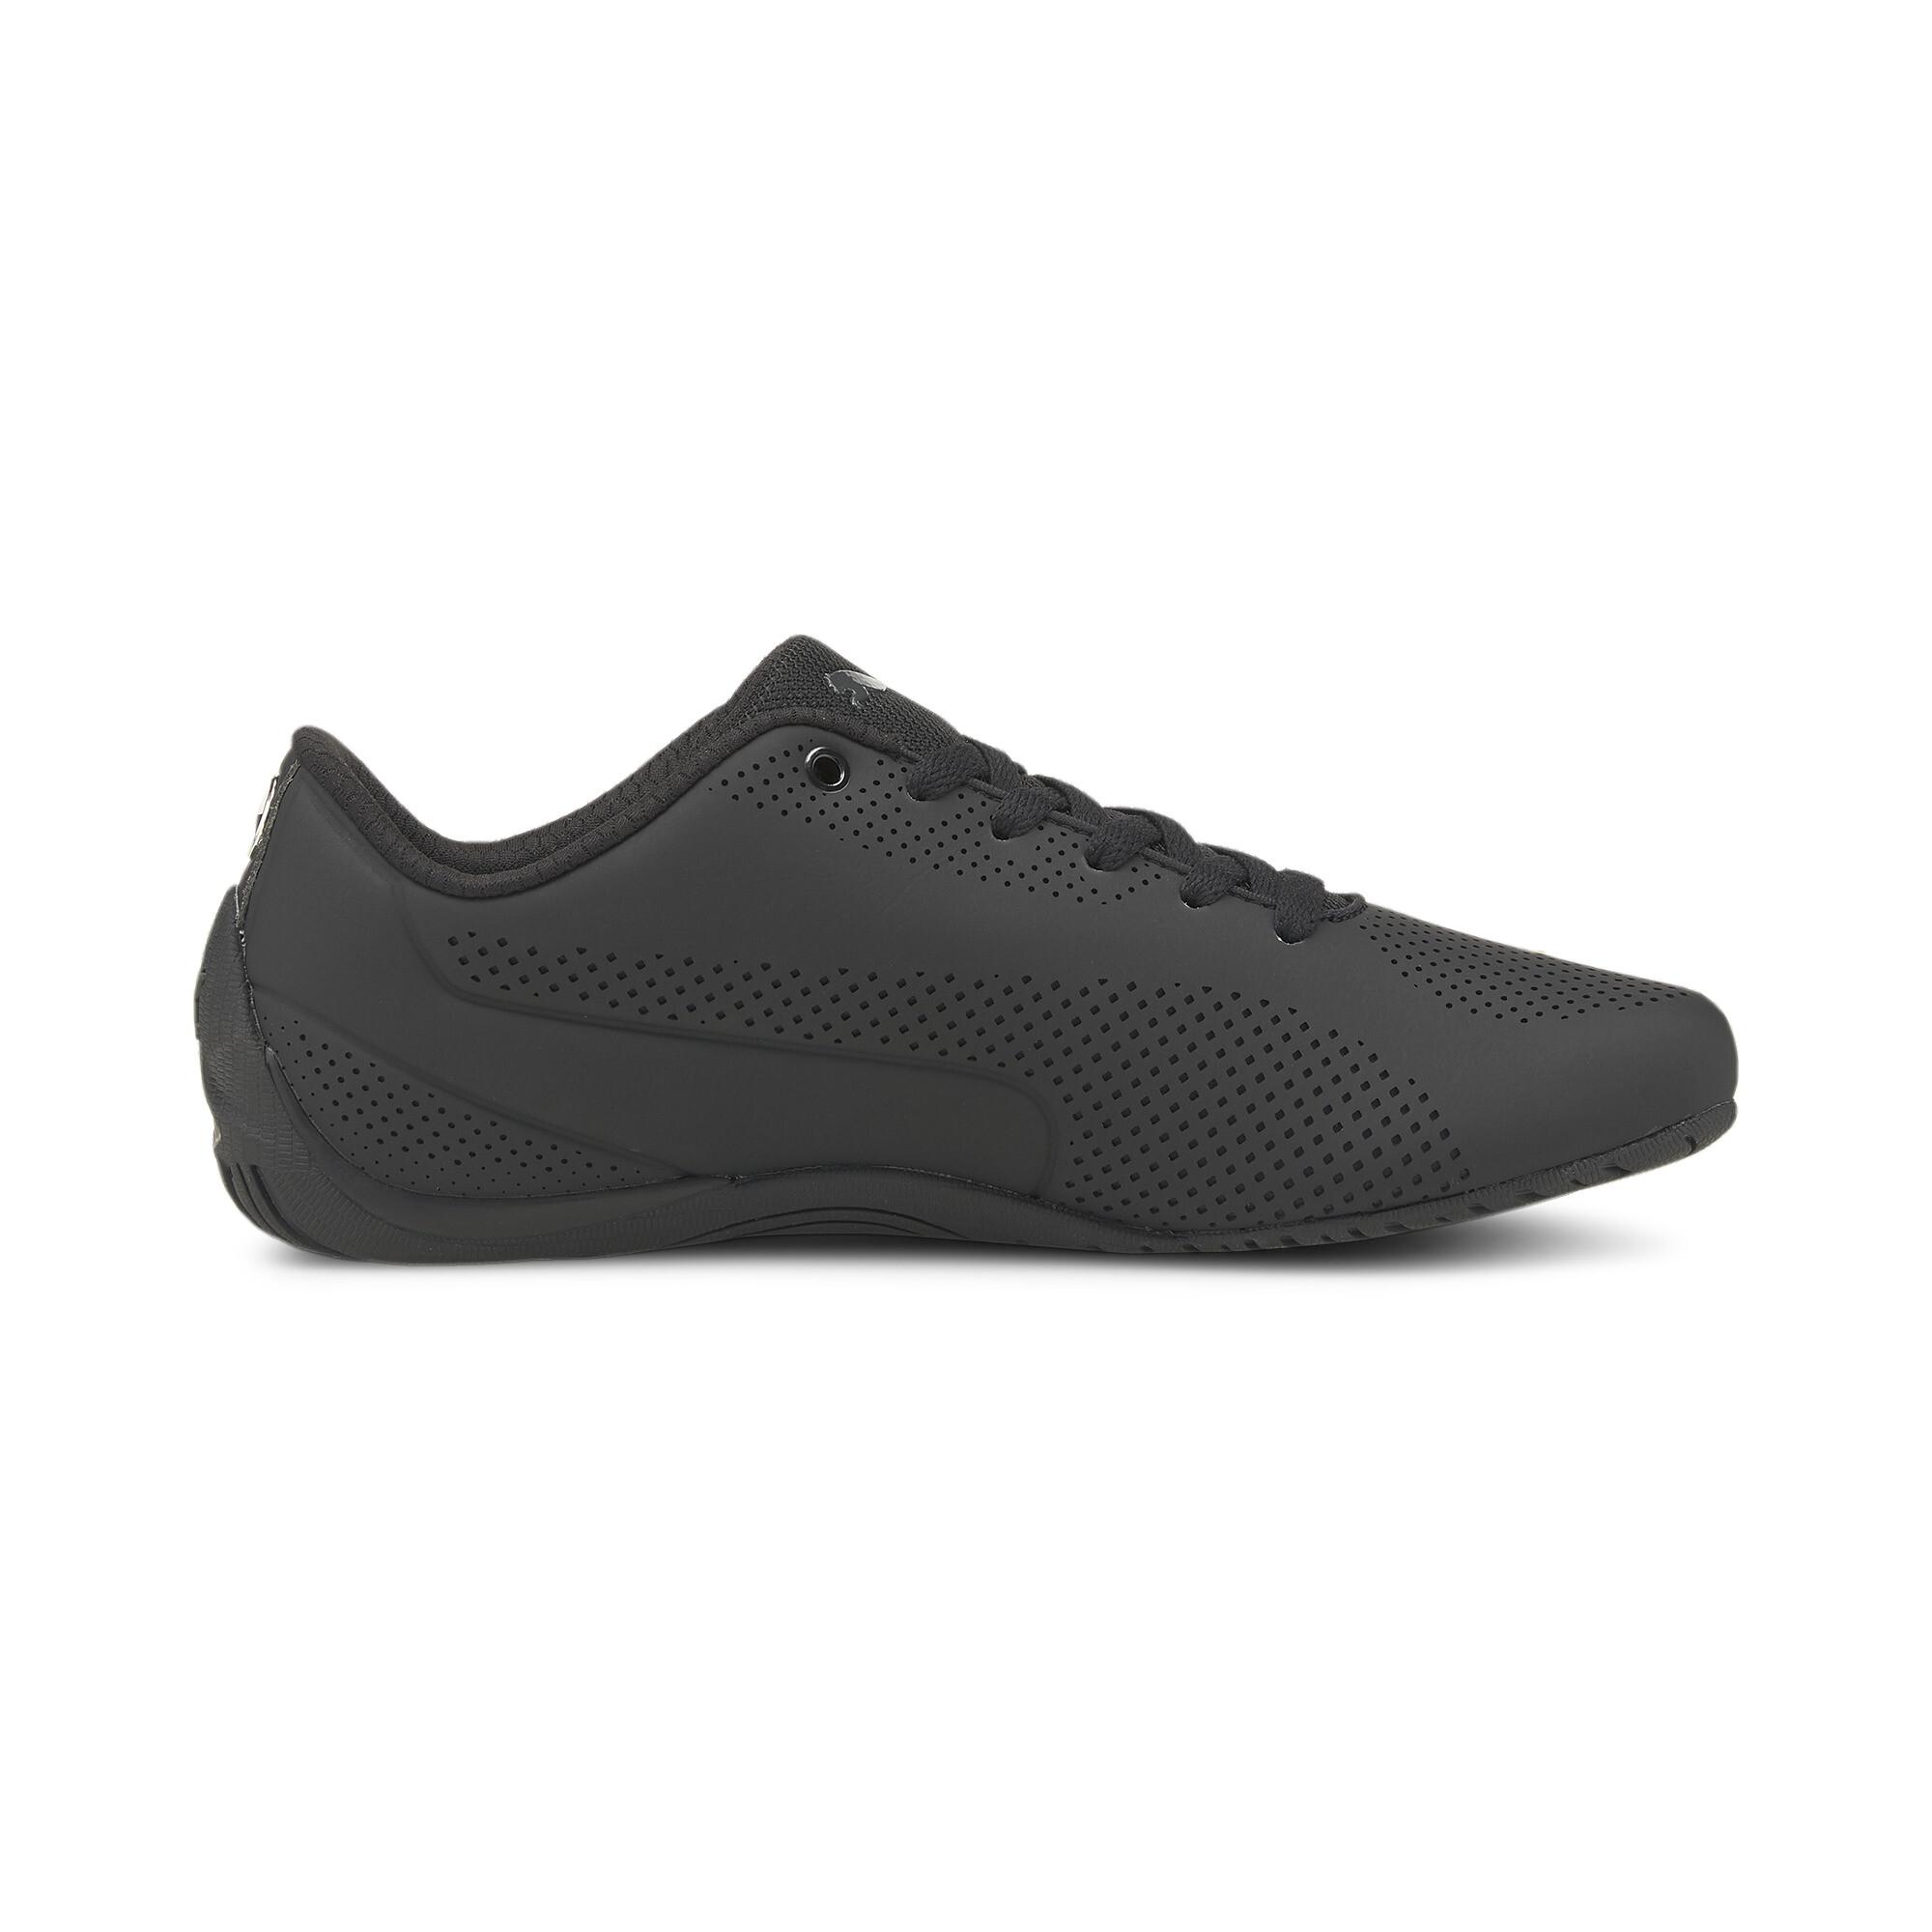 PUMA-MERCEDES-AMG-PETRONAS-Drift-Cat-Ultra-Sneaker-Unisex-Schuhe-Neu Indexbild 11